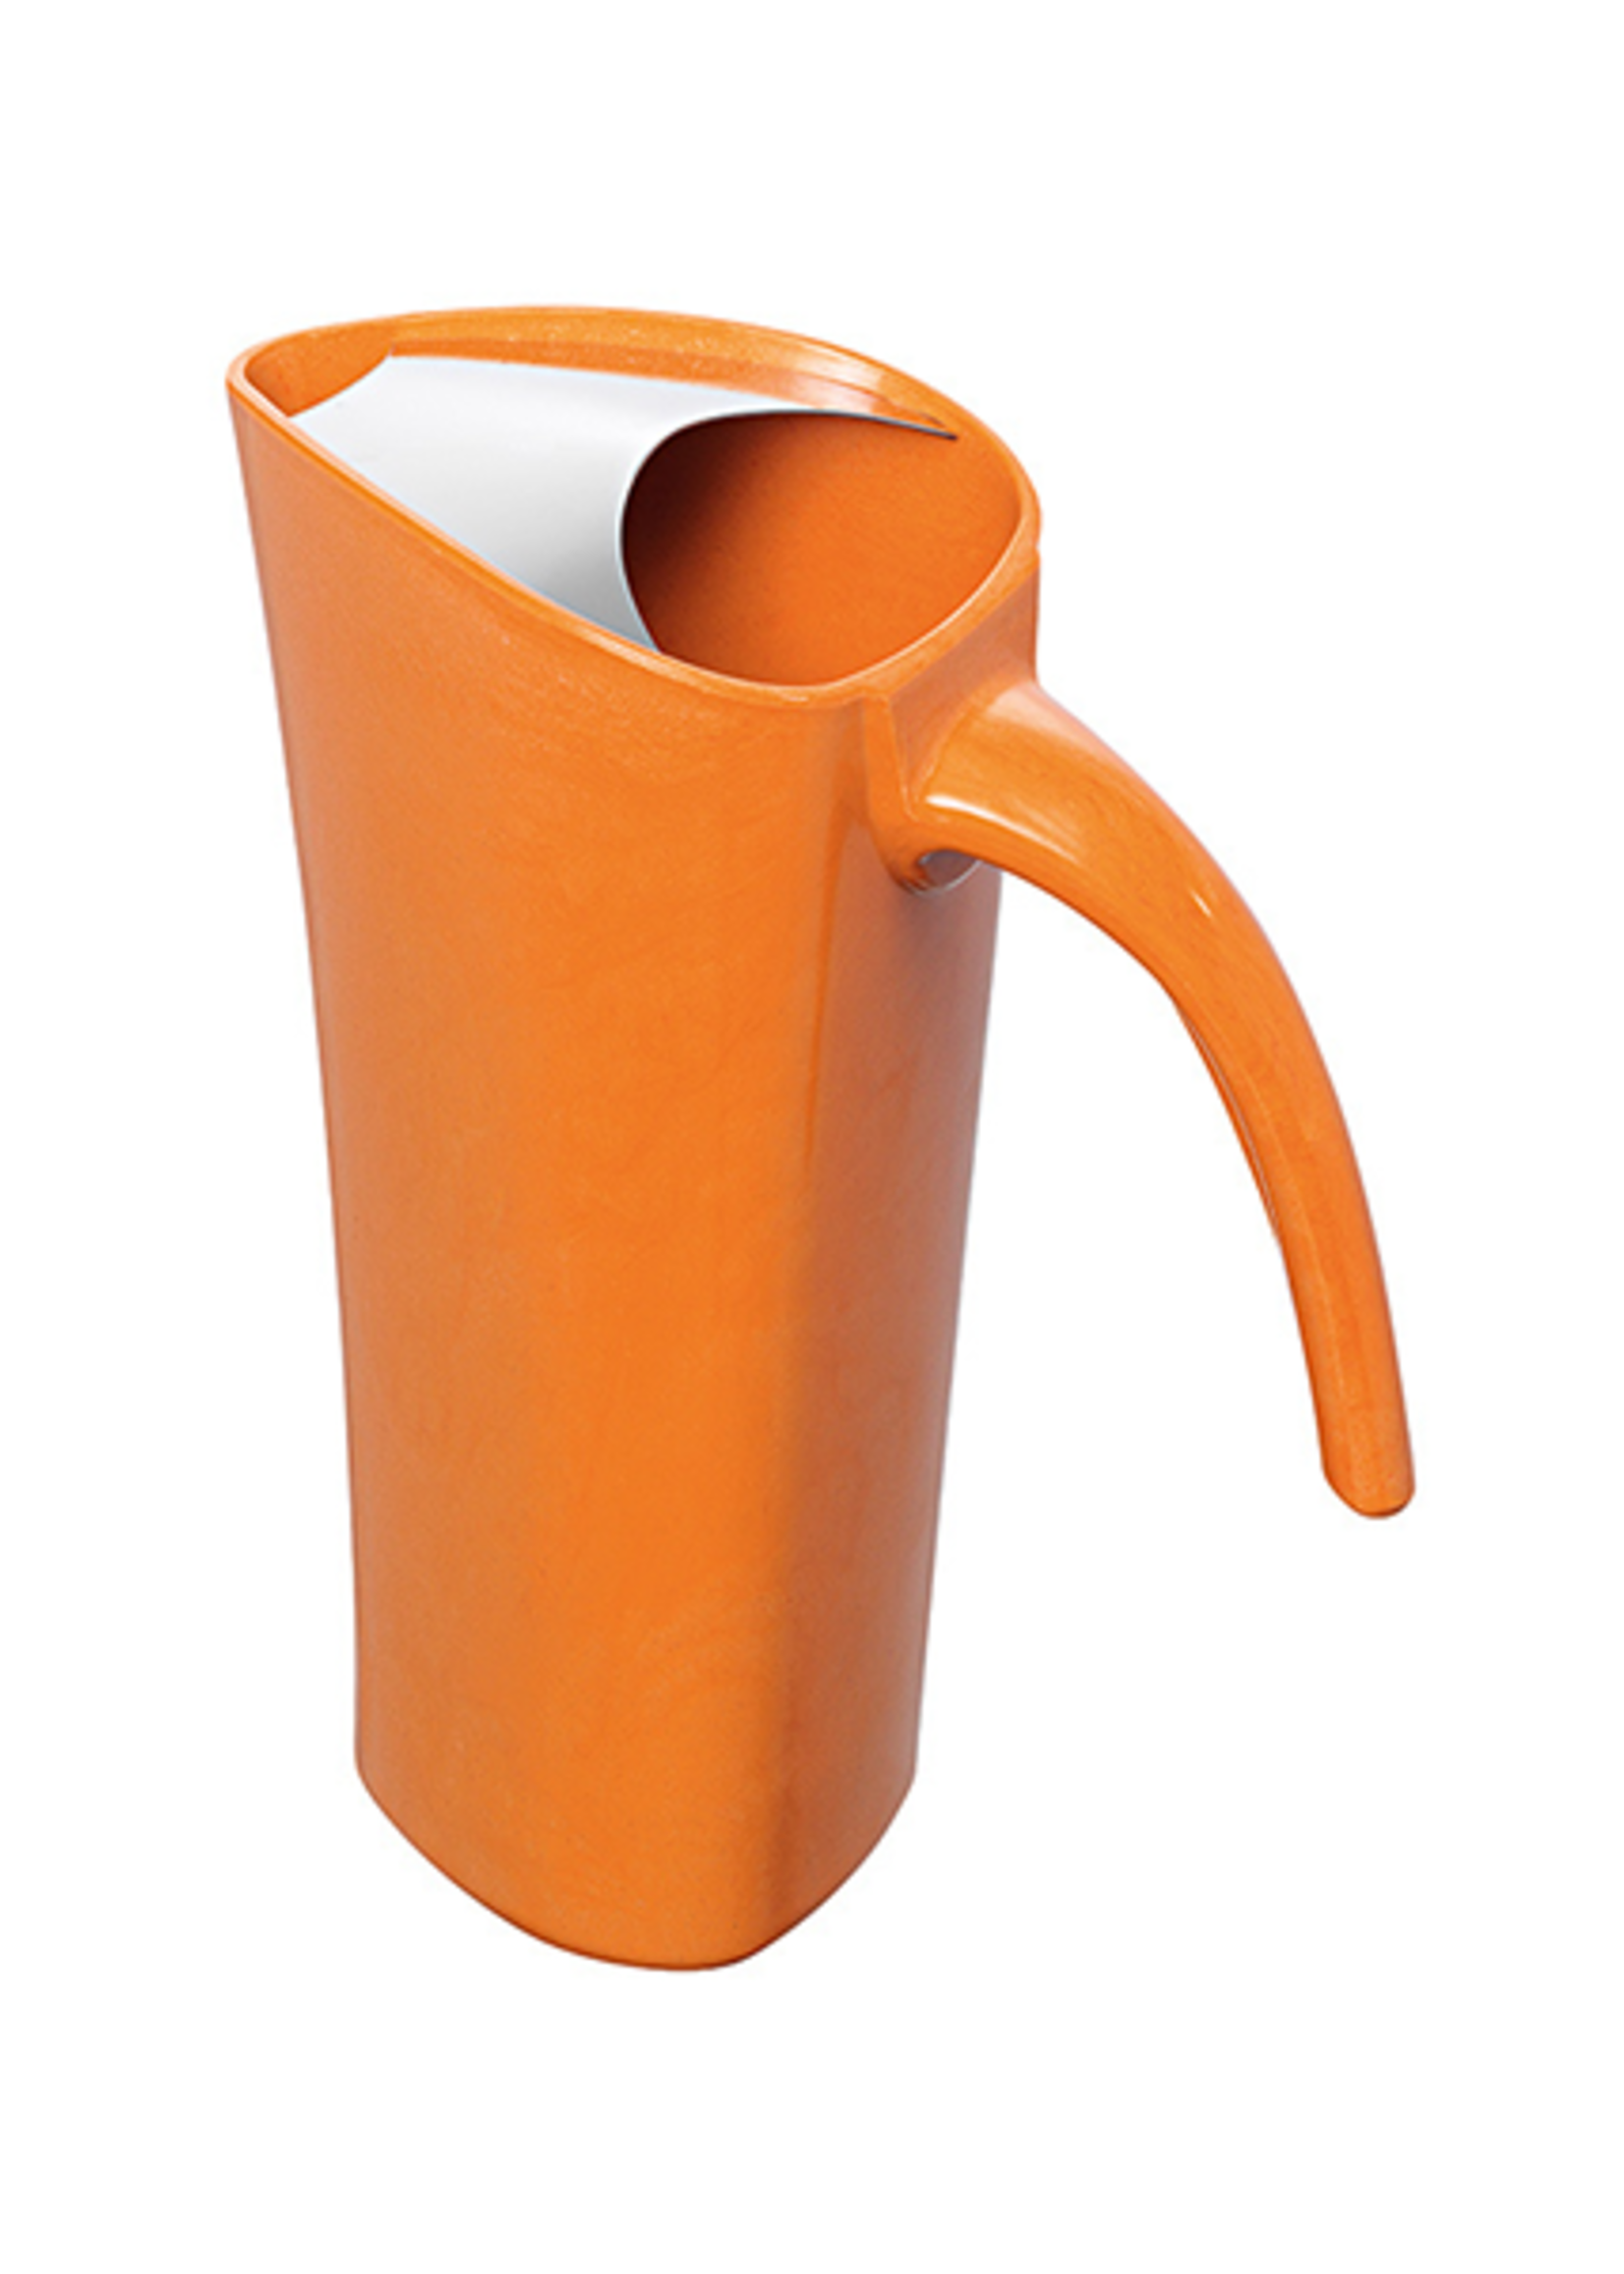 Avanti Homewares Zute Water Pitcher 1.8L Orange